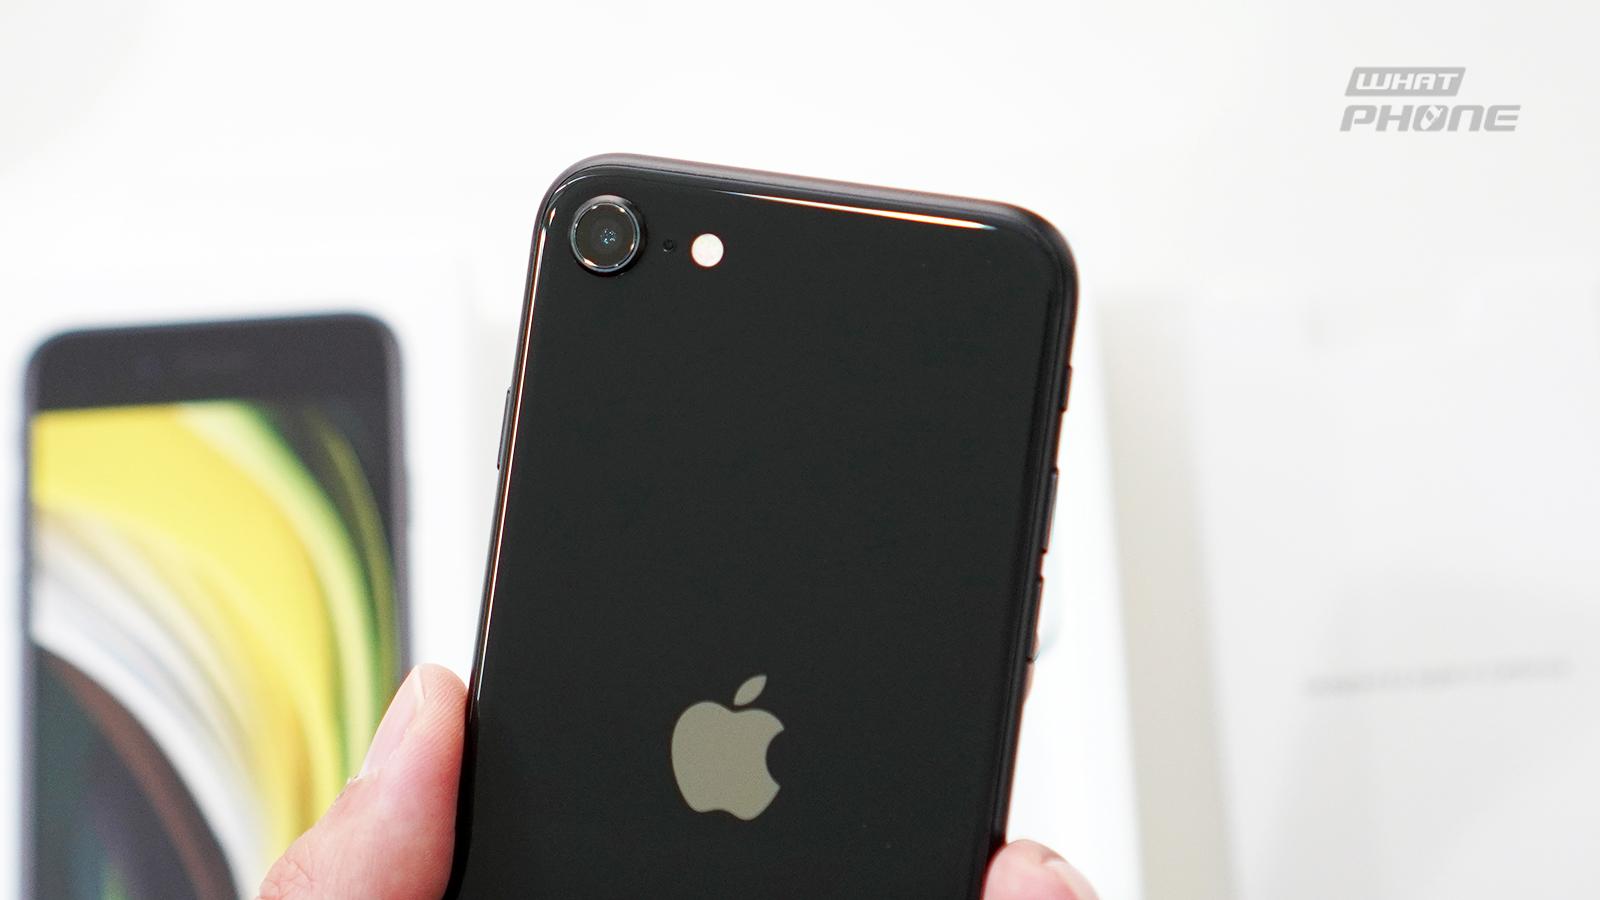 Unbox-iPhone-SE-2-11